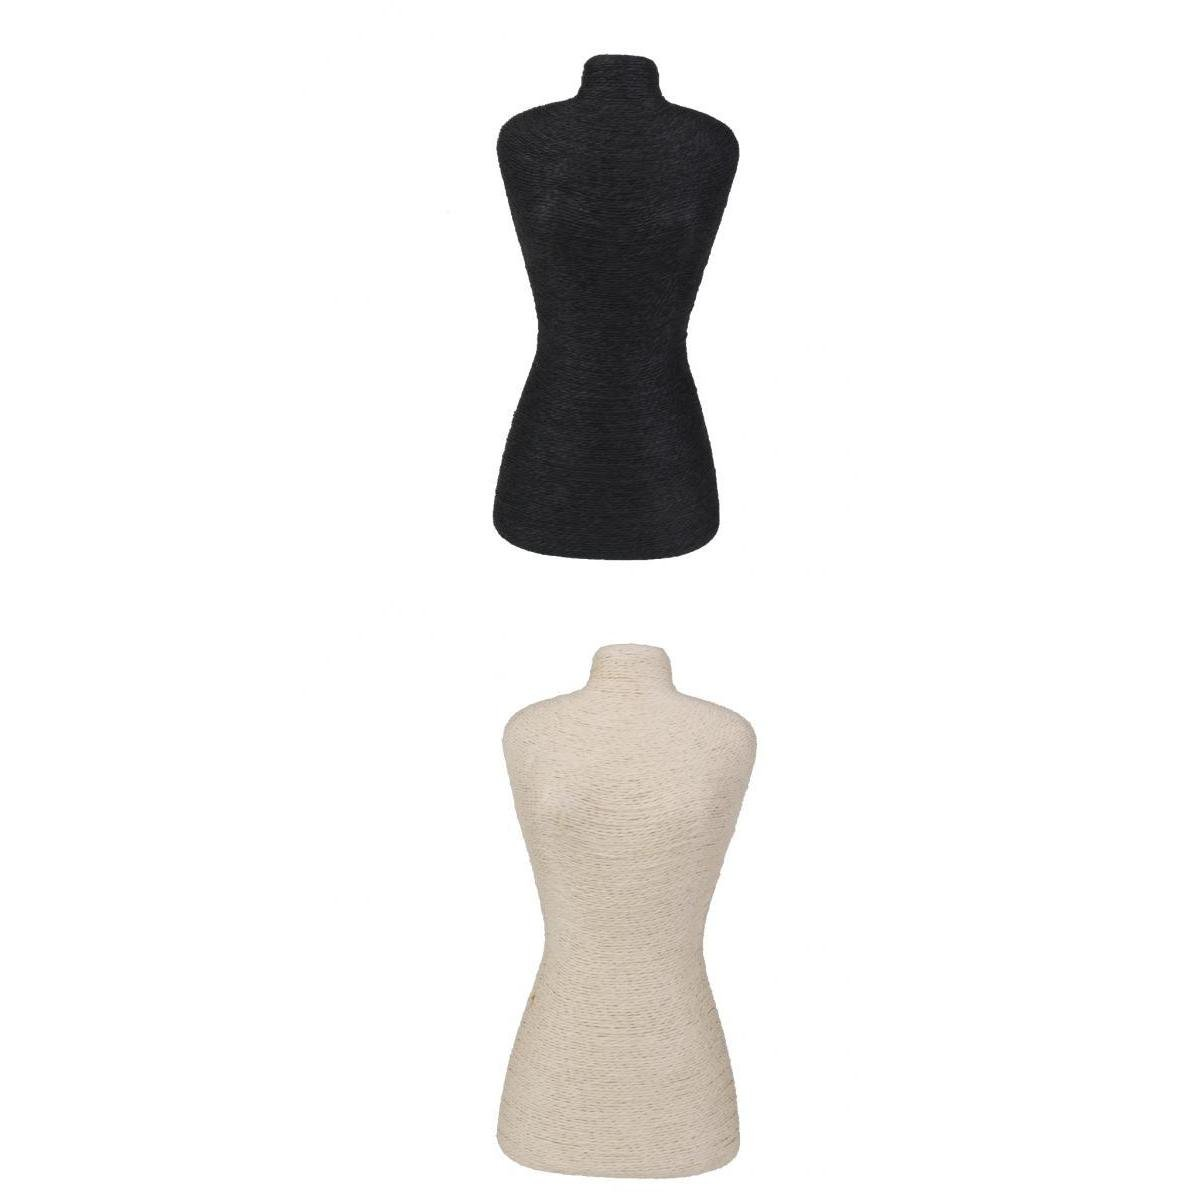 MagiDeal Female Dress Form Mannequin Body Torso Black Beige